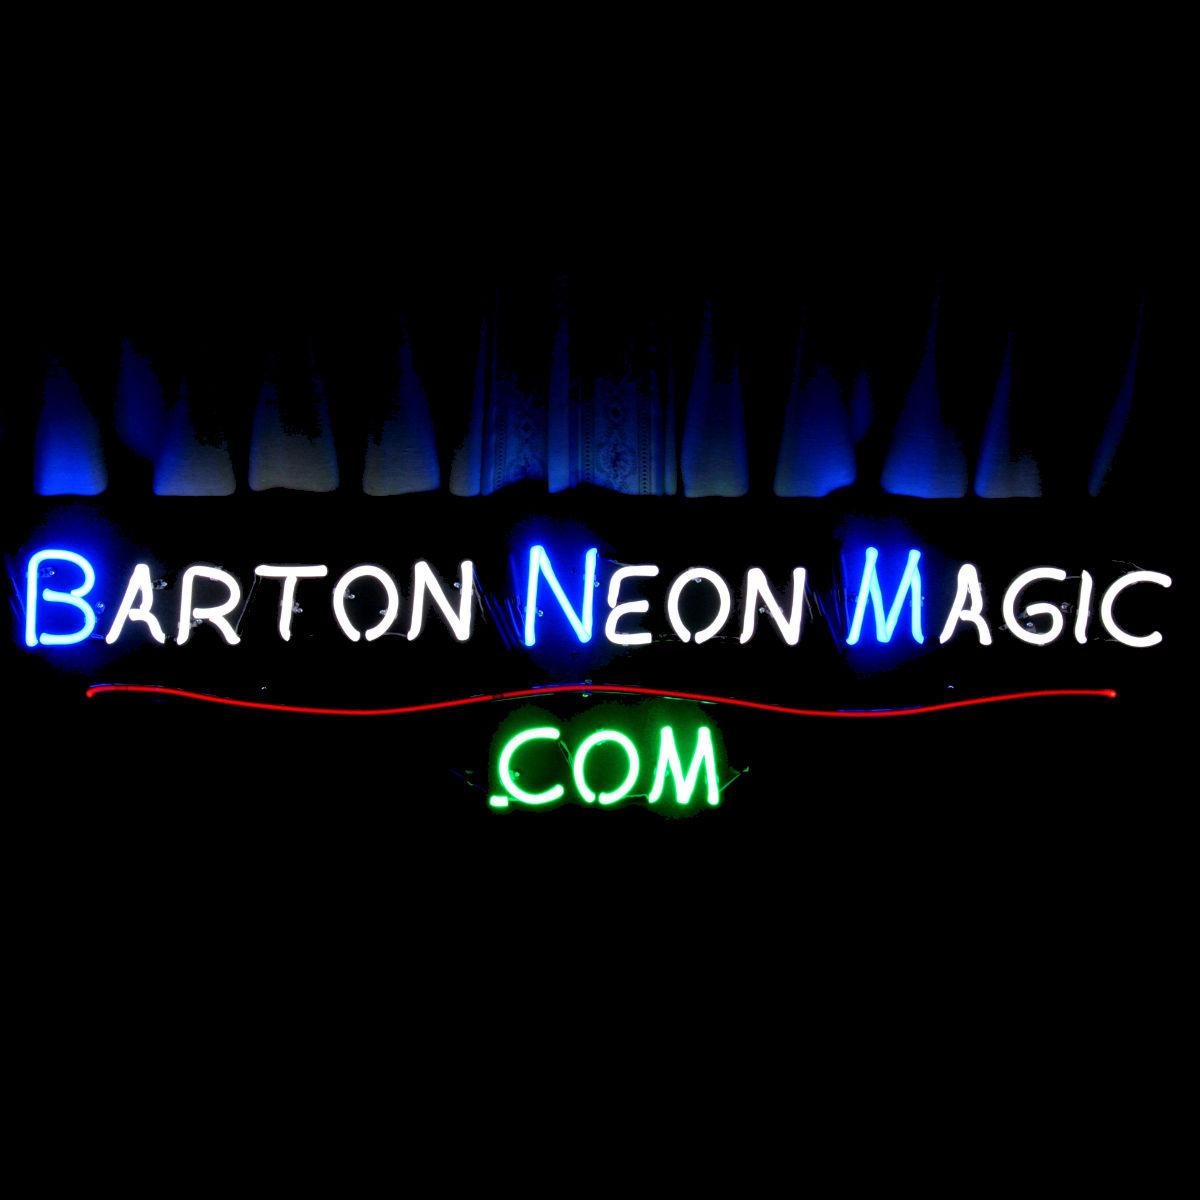 Custom Neon Lighting - Direct from Artist - John Barton - BartonNeonMagic.com